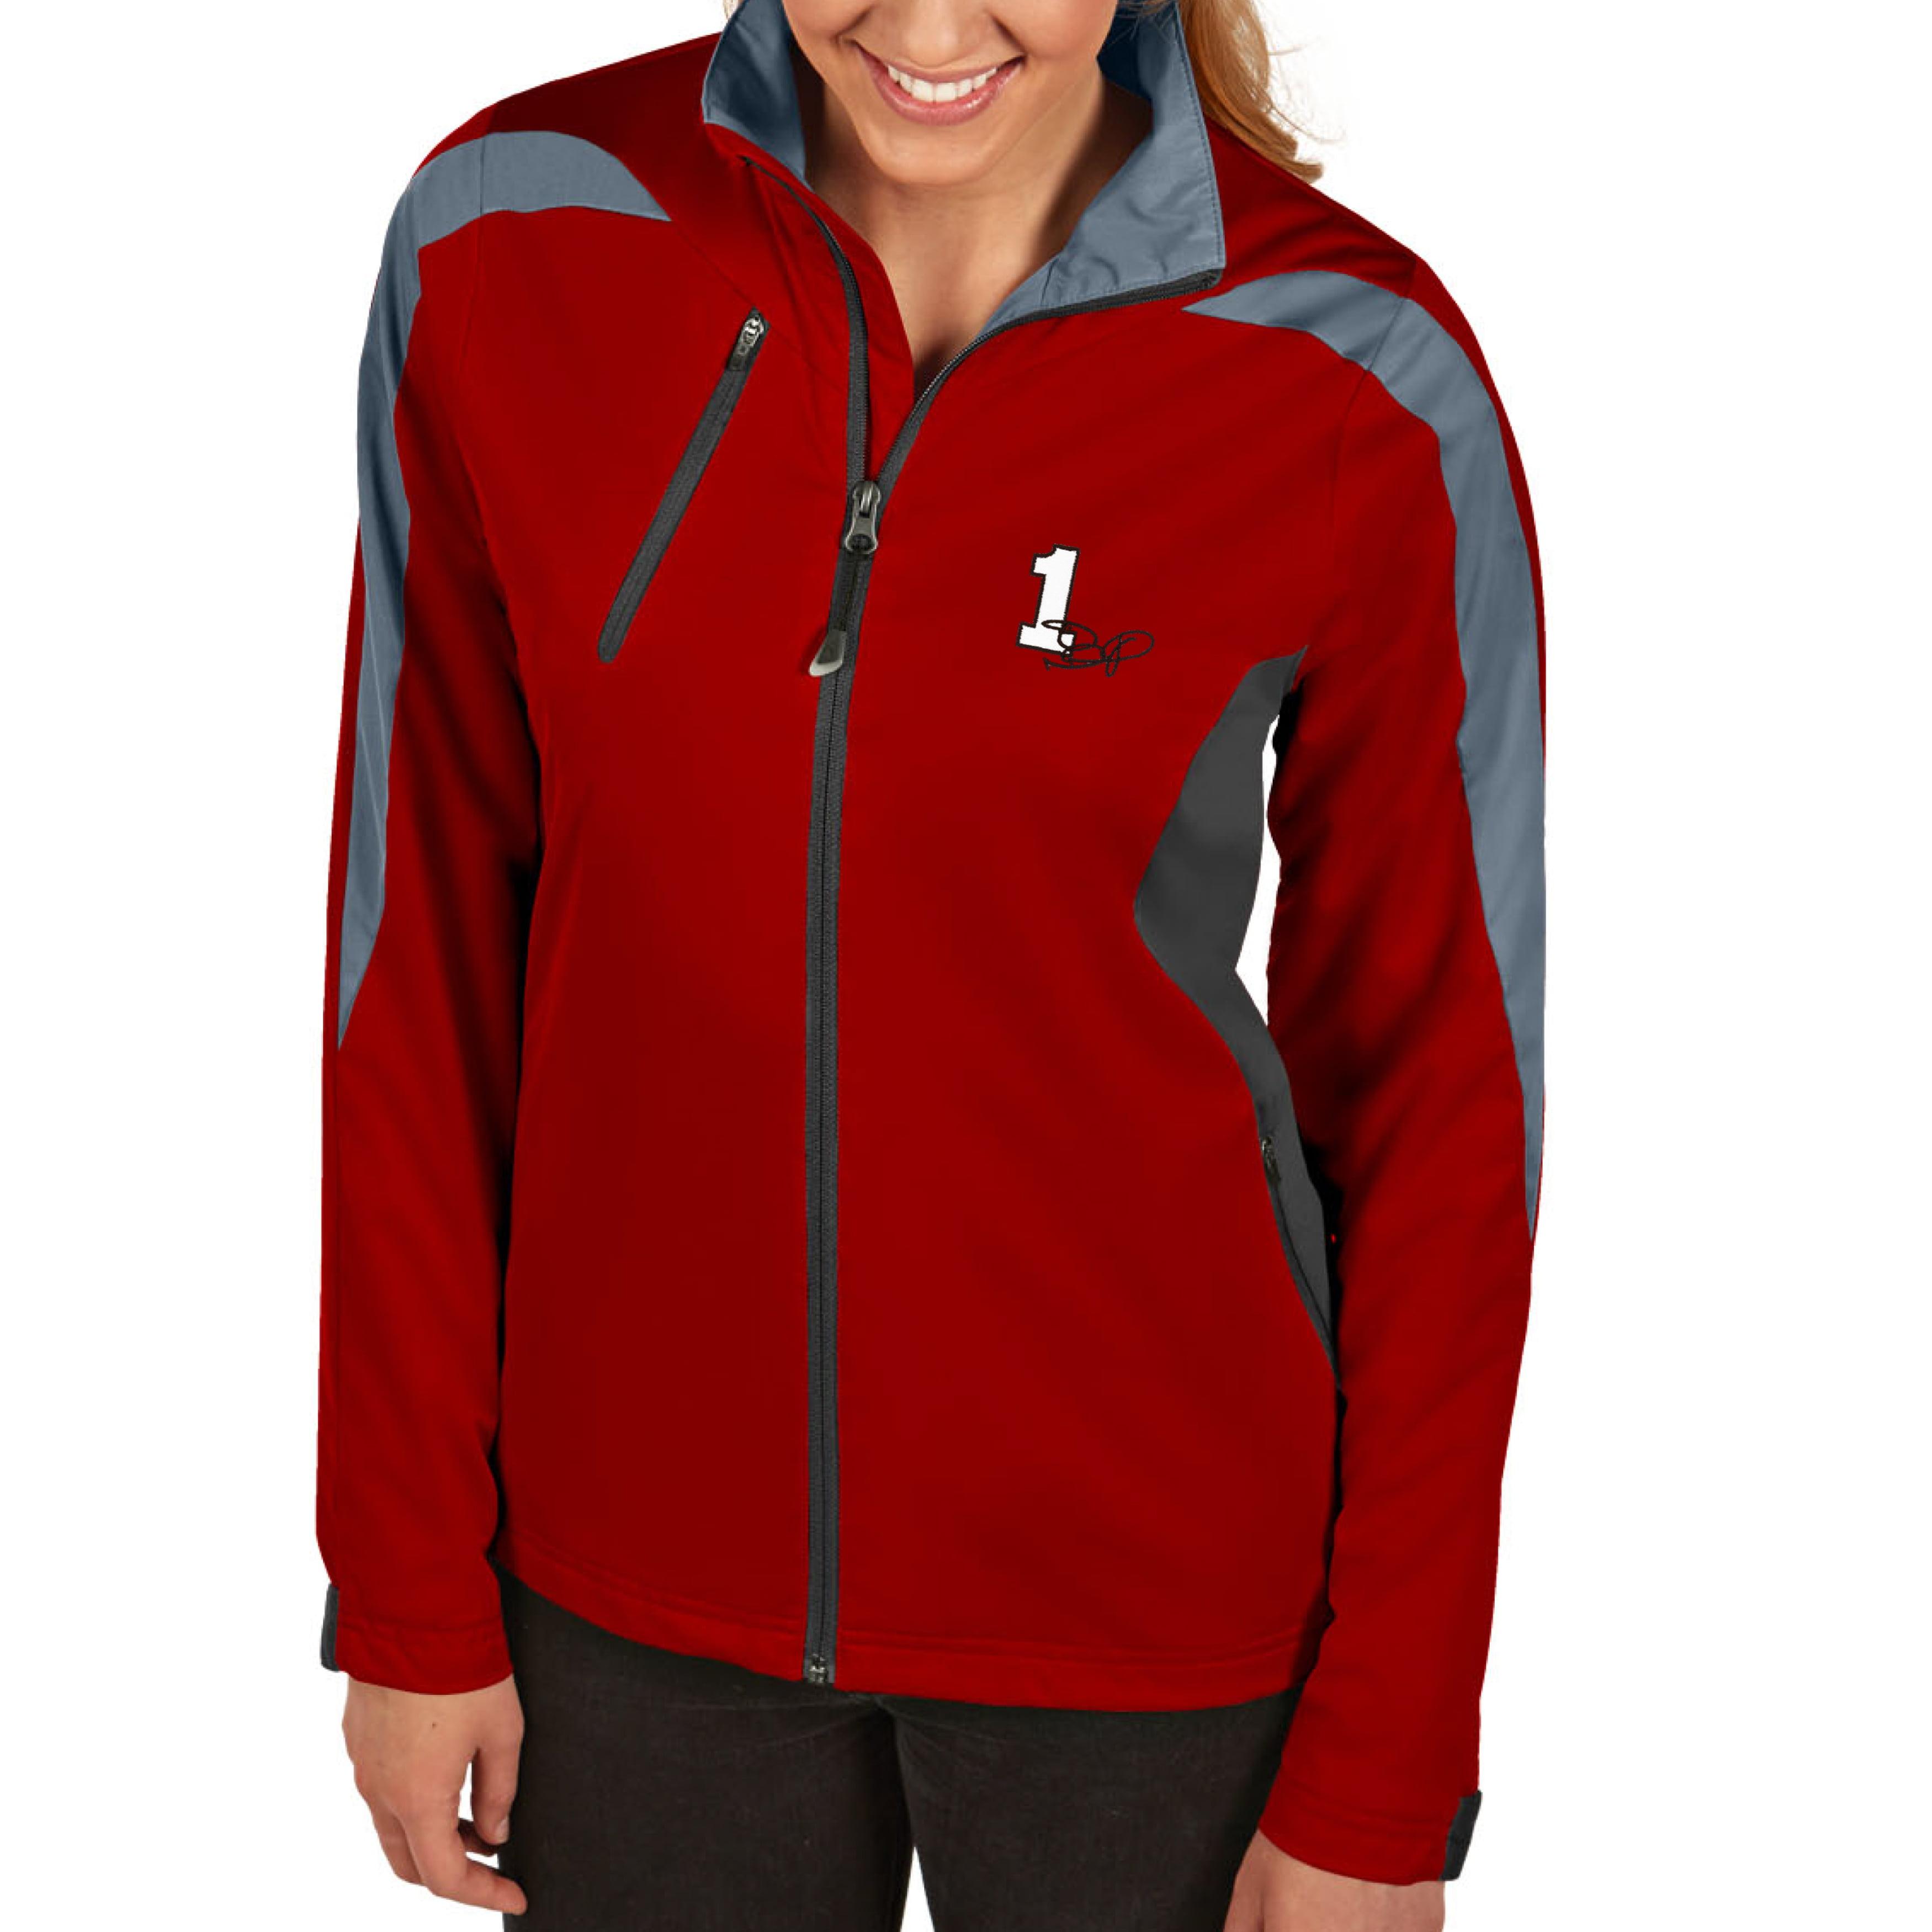 Jamie McMurray Antigua Women's Discover Full Zip Jacket - Red